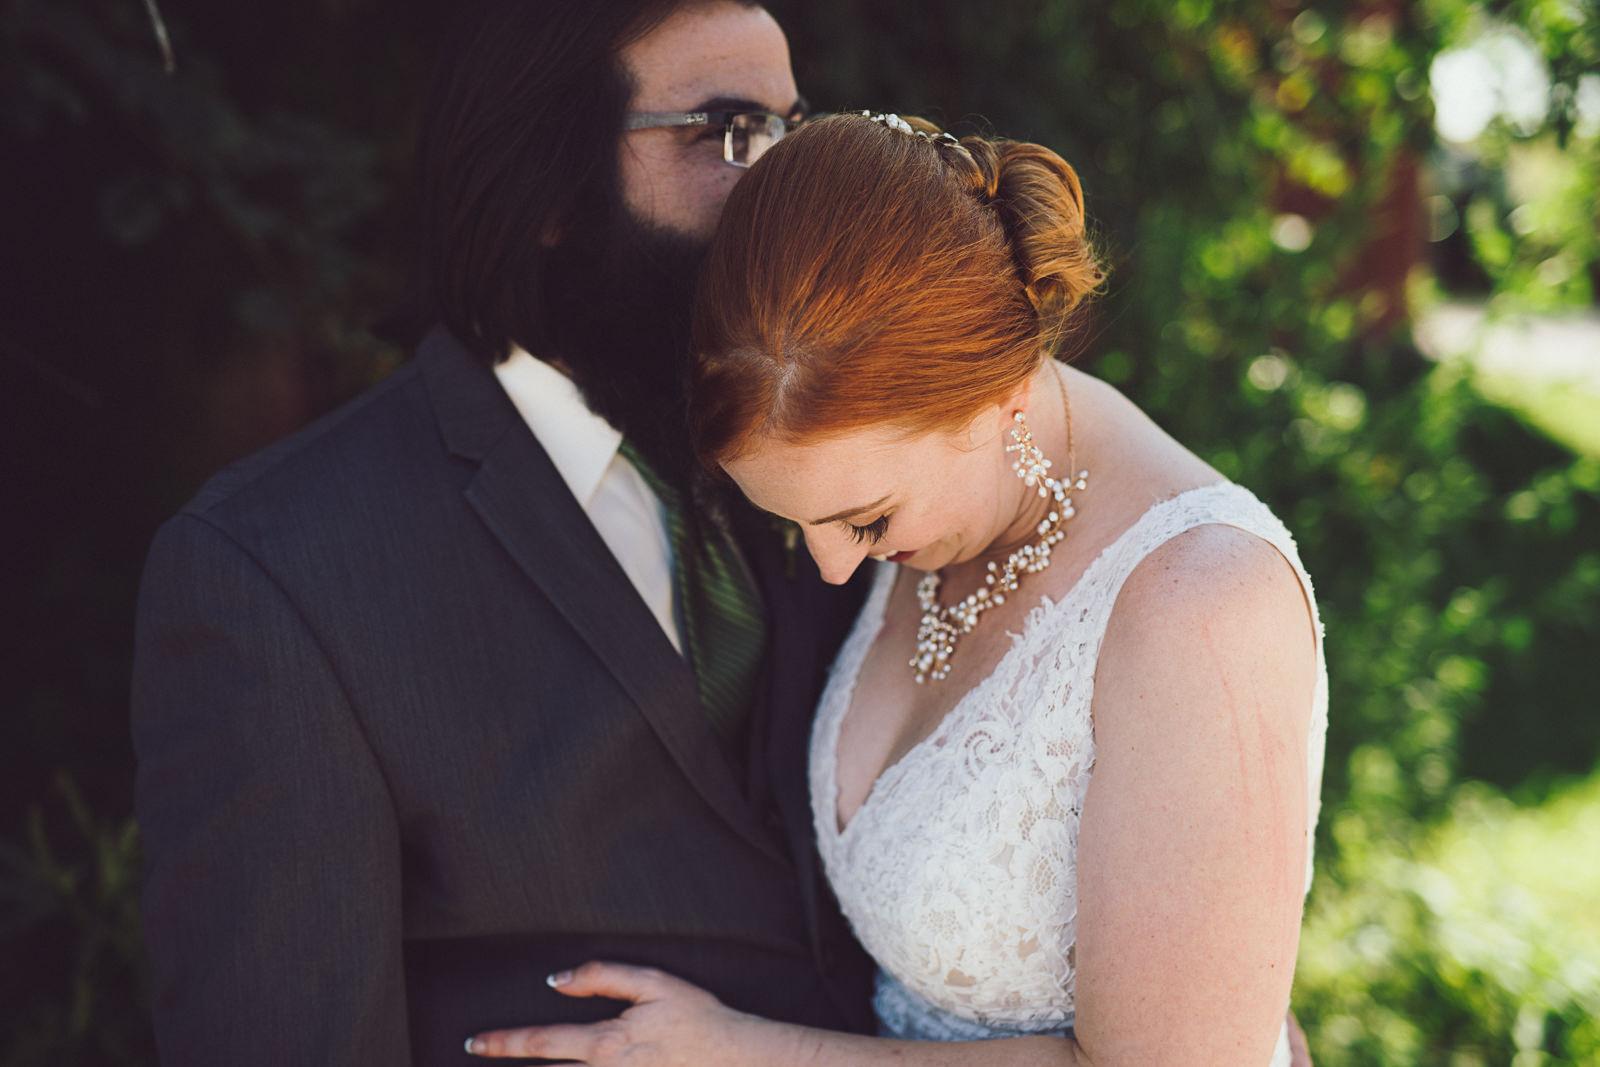 wedding-keely-caleb-417-name-your-photo.jpg